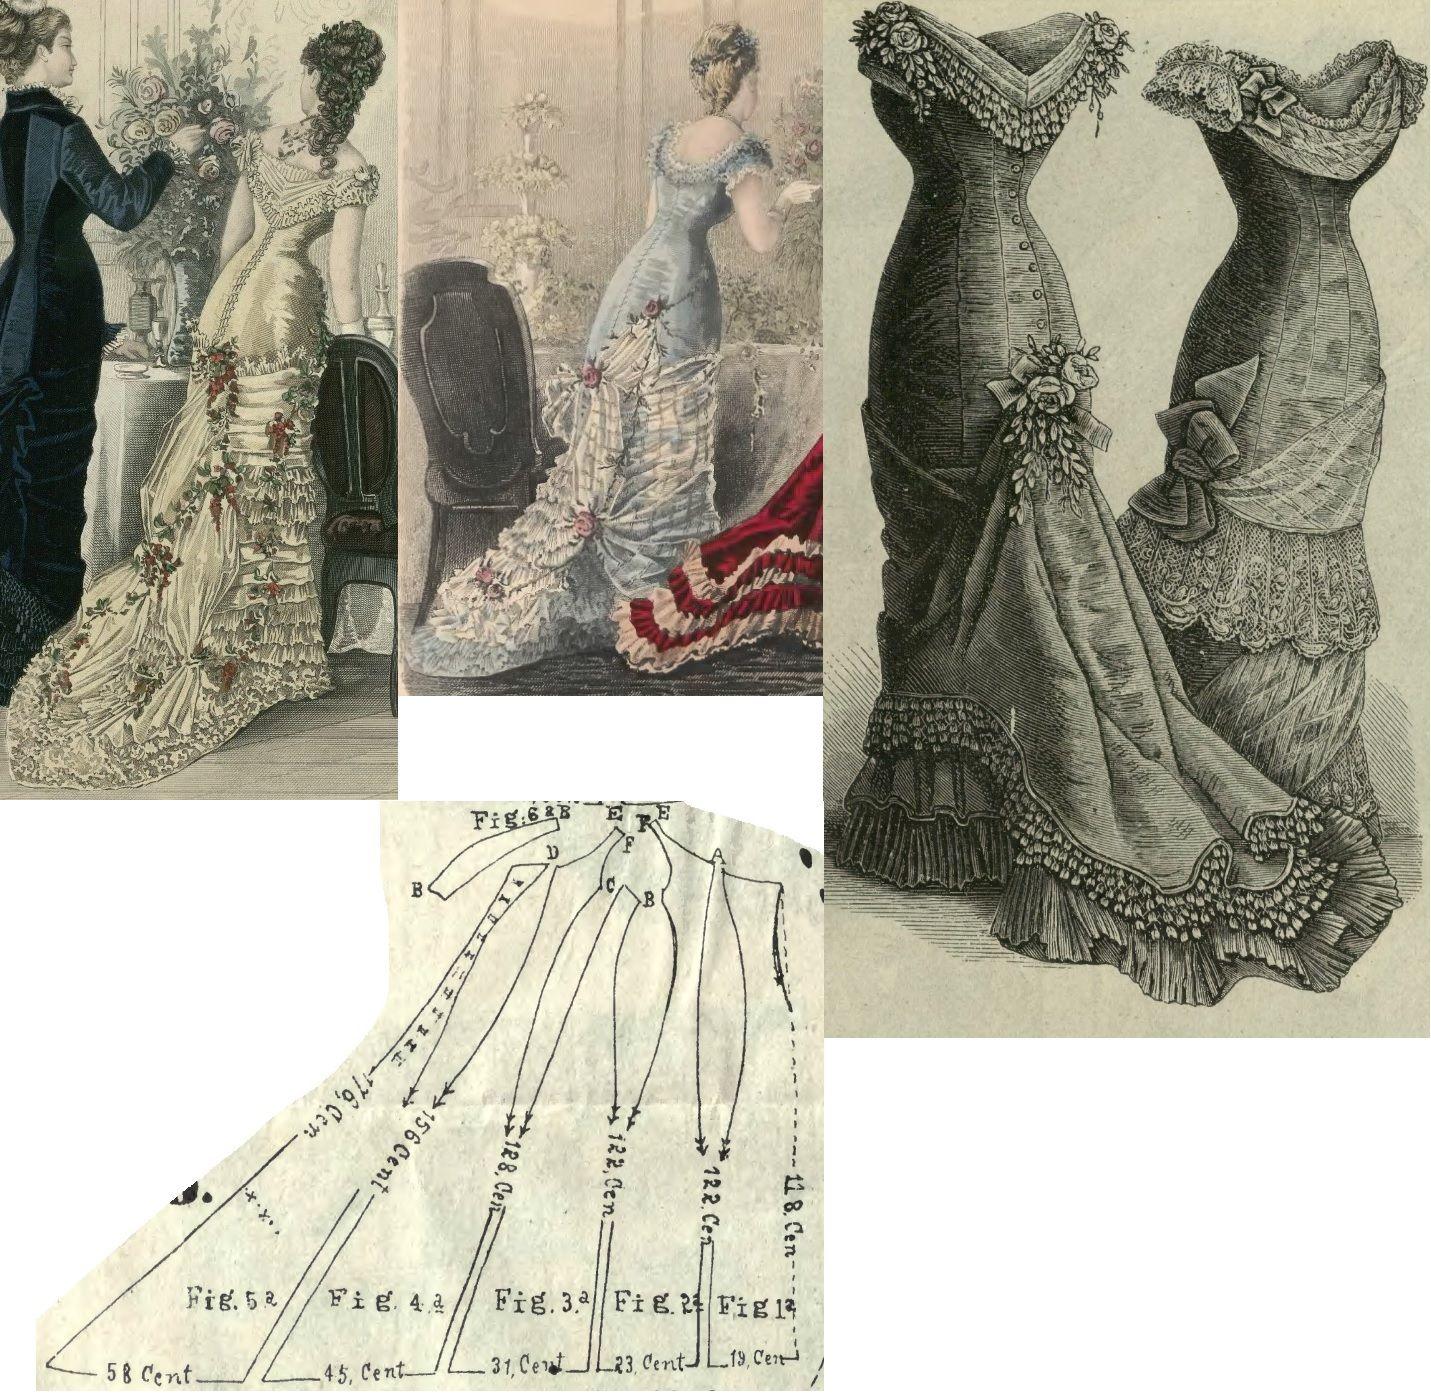 Tygodnik mód princess form gown as ball dress with various